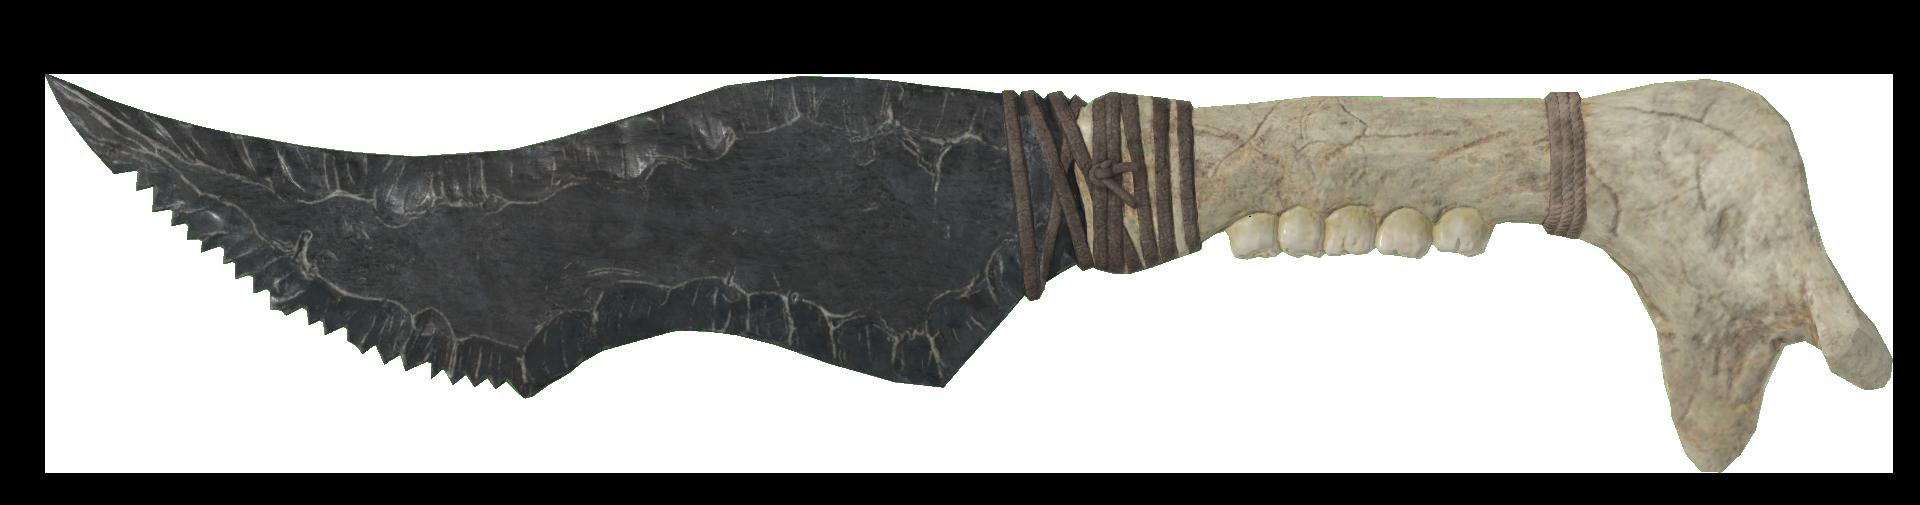 Cultist dagger